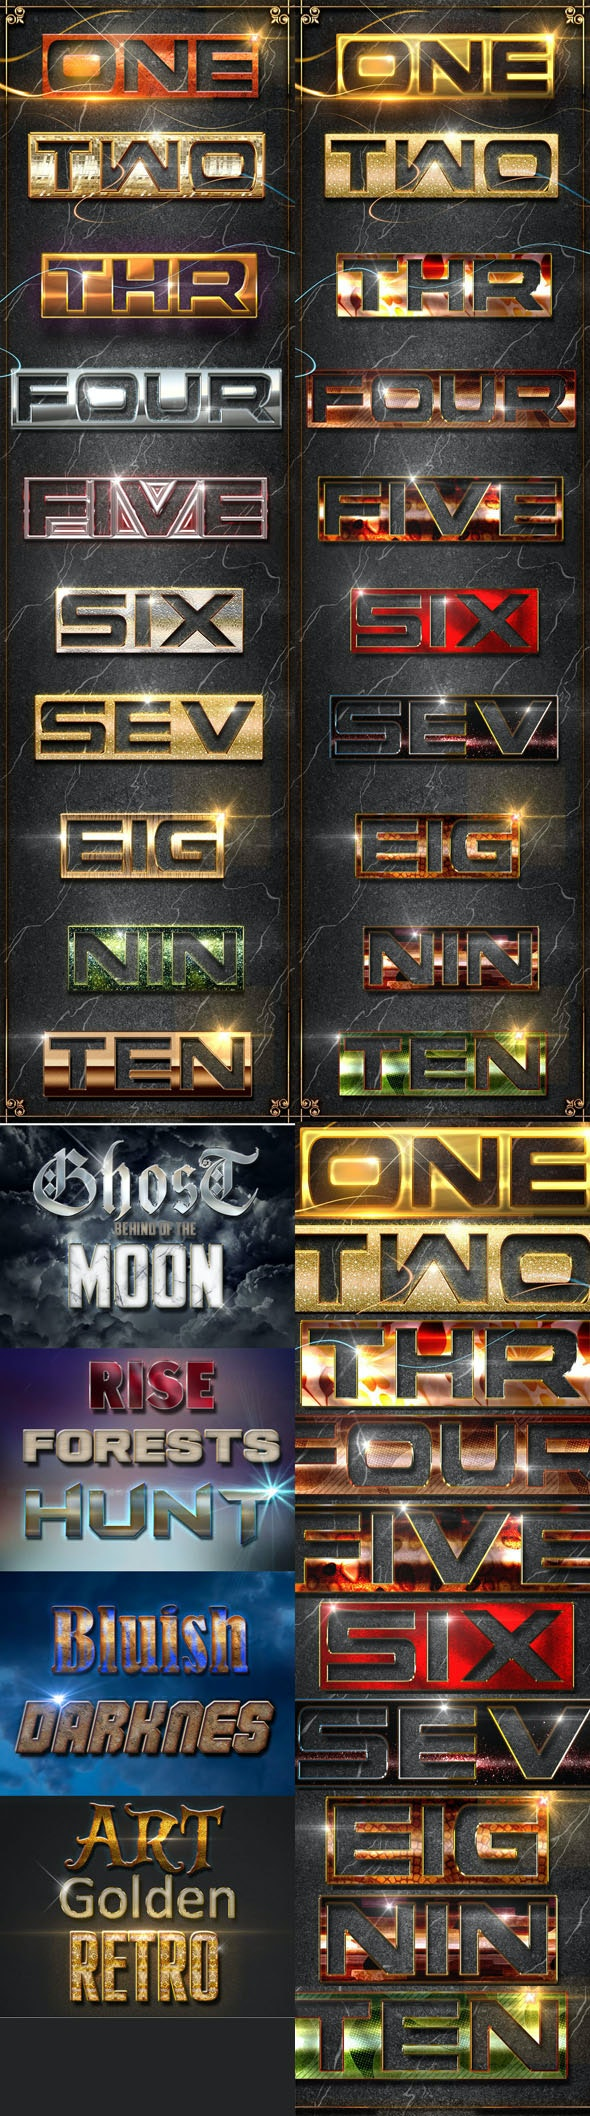 30 Bundle Dian_8 - Styles Photoshop